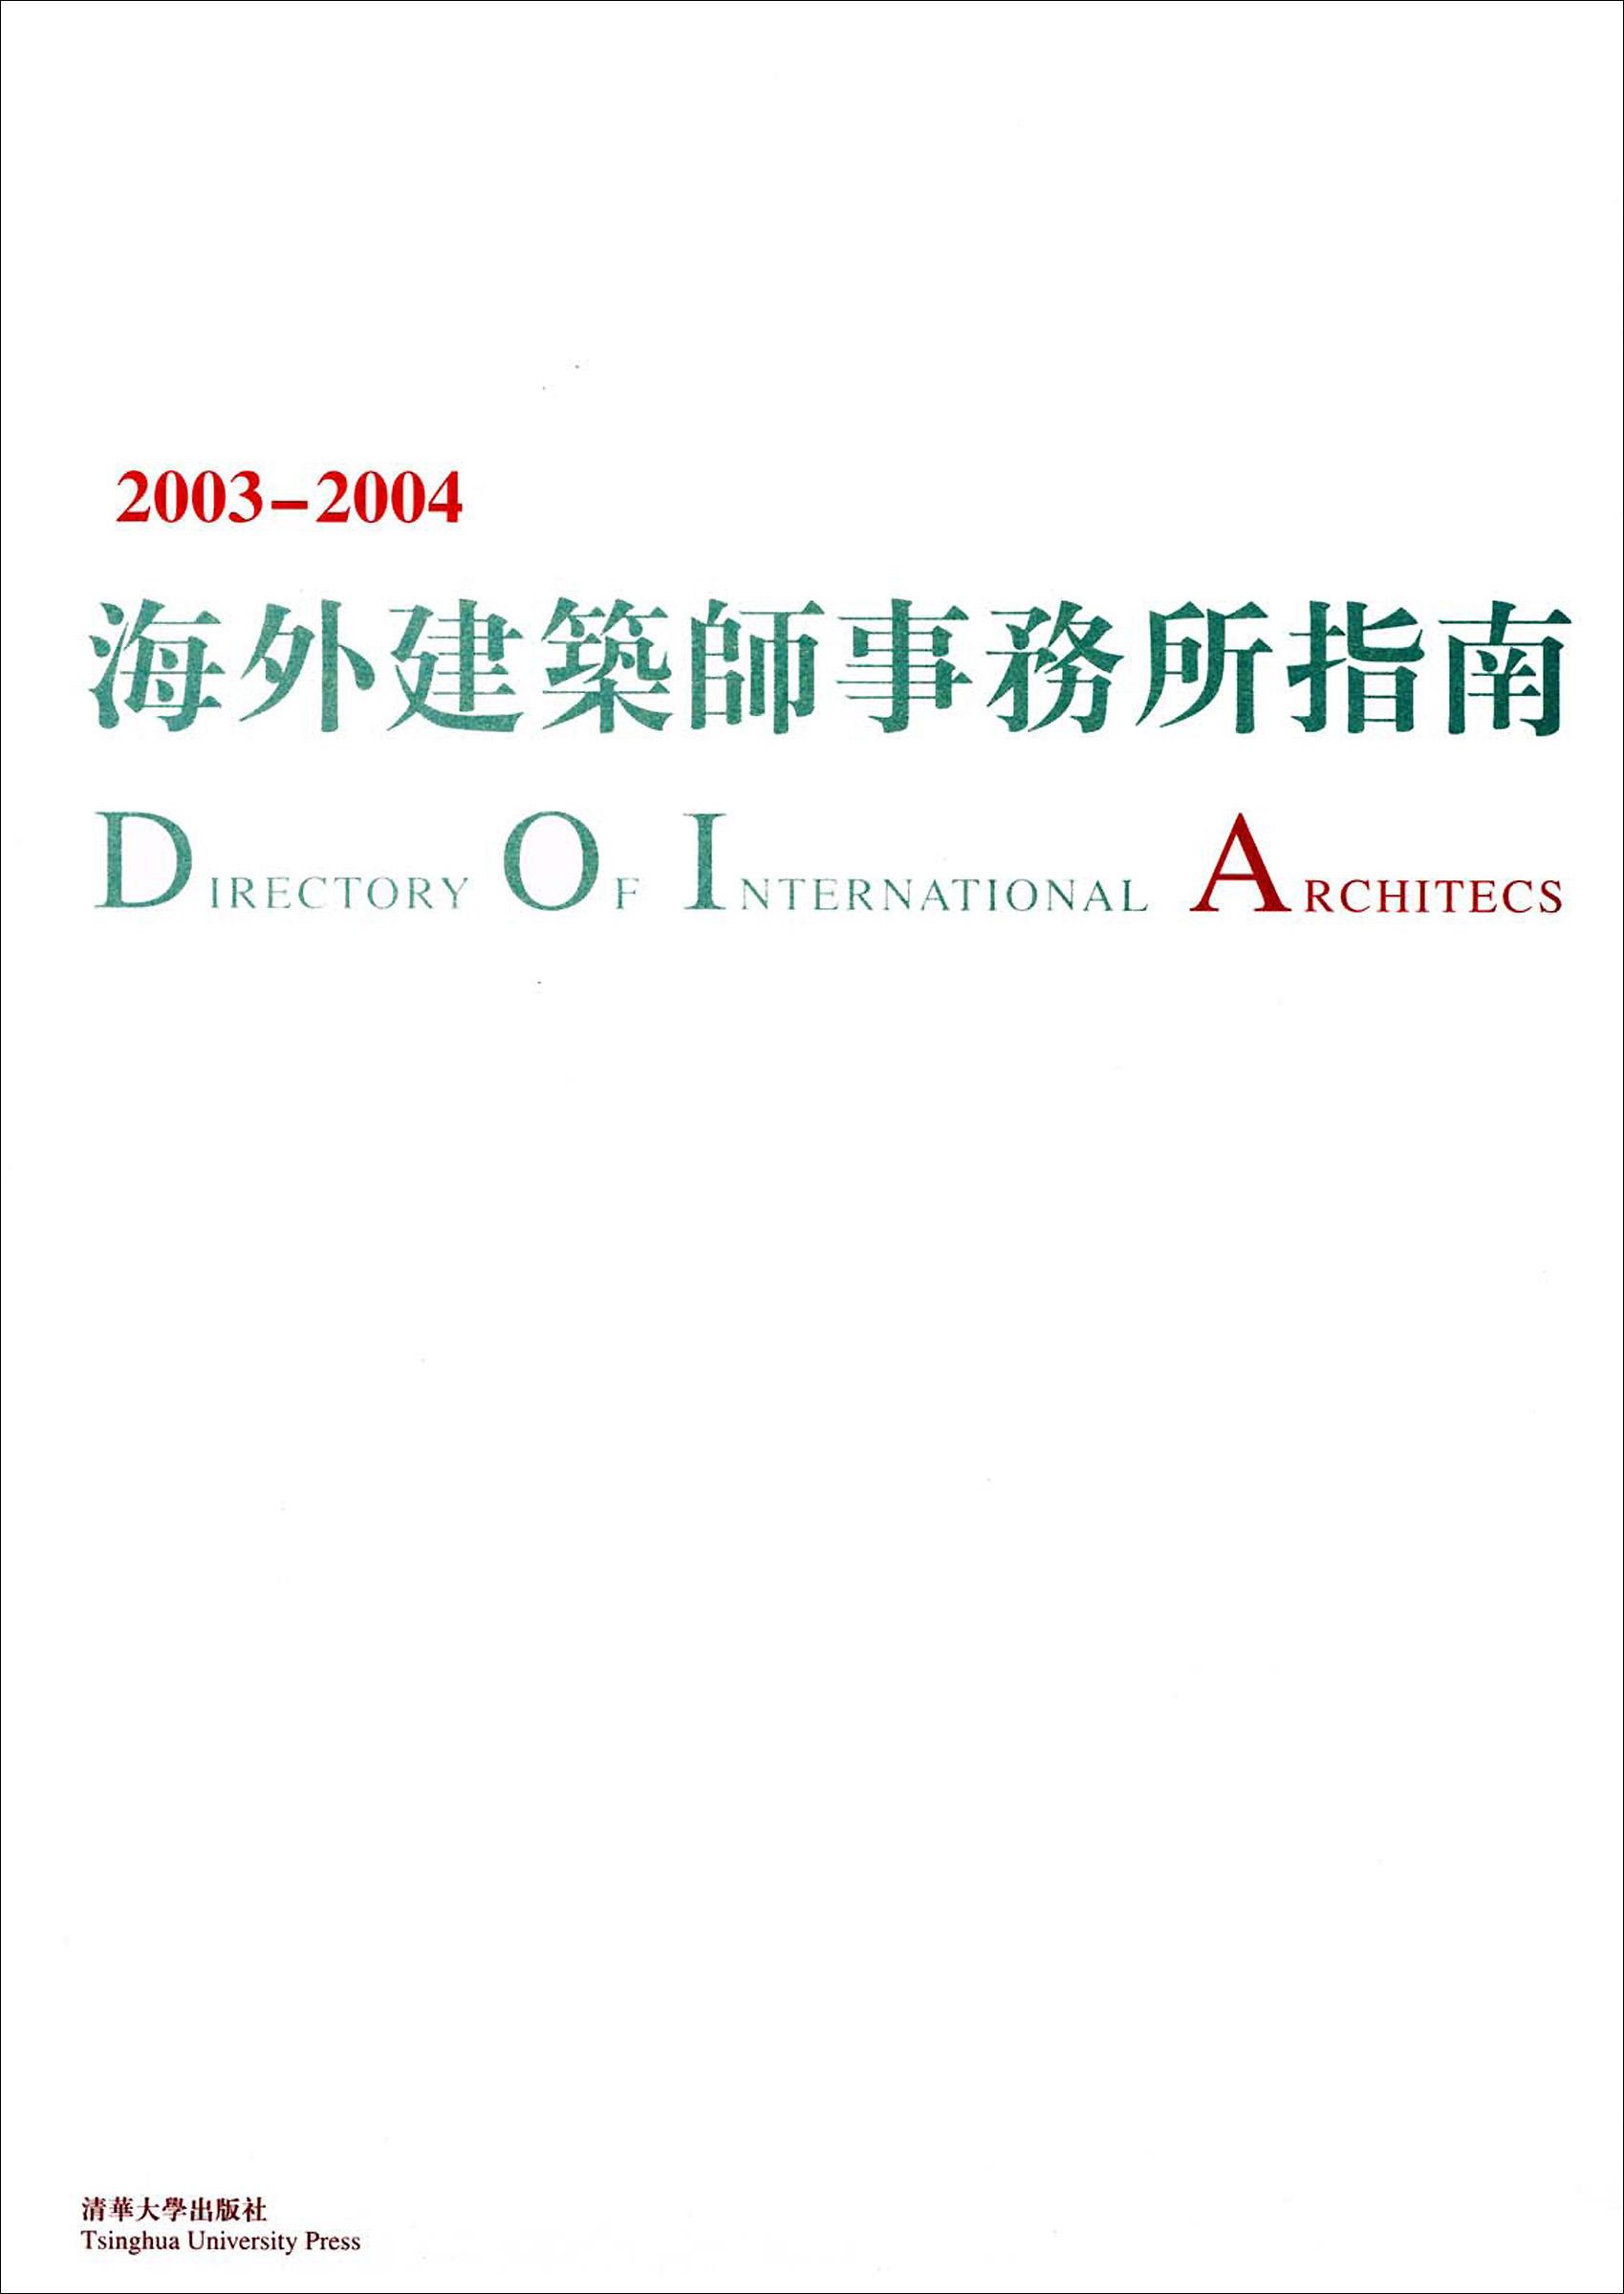 Directory of International Architects 2003-2004